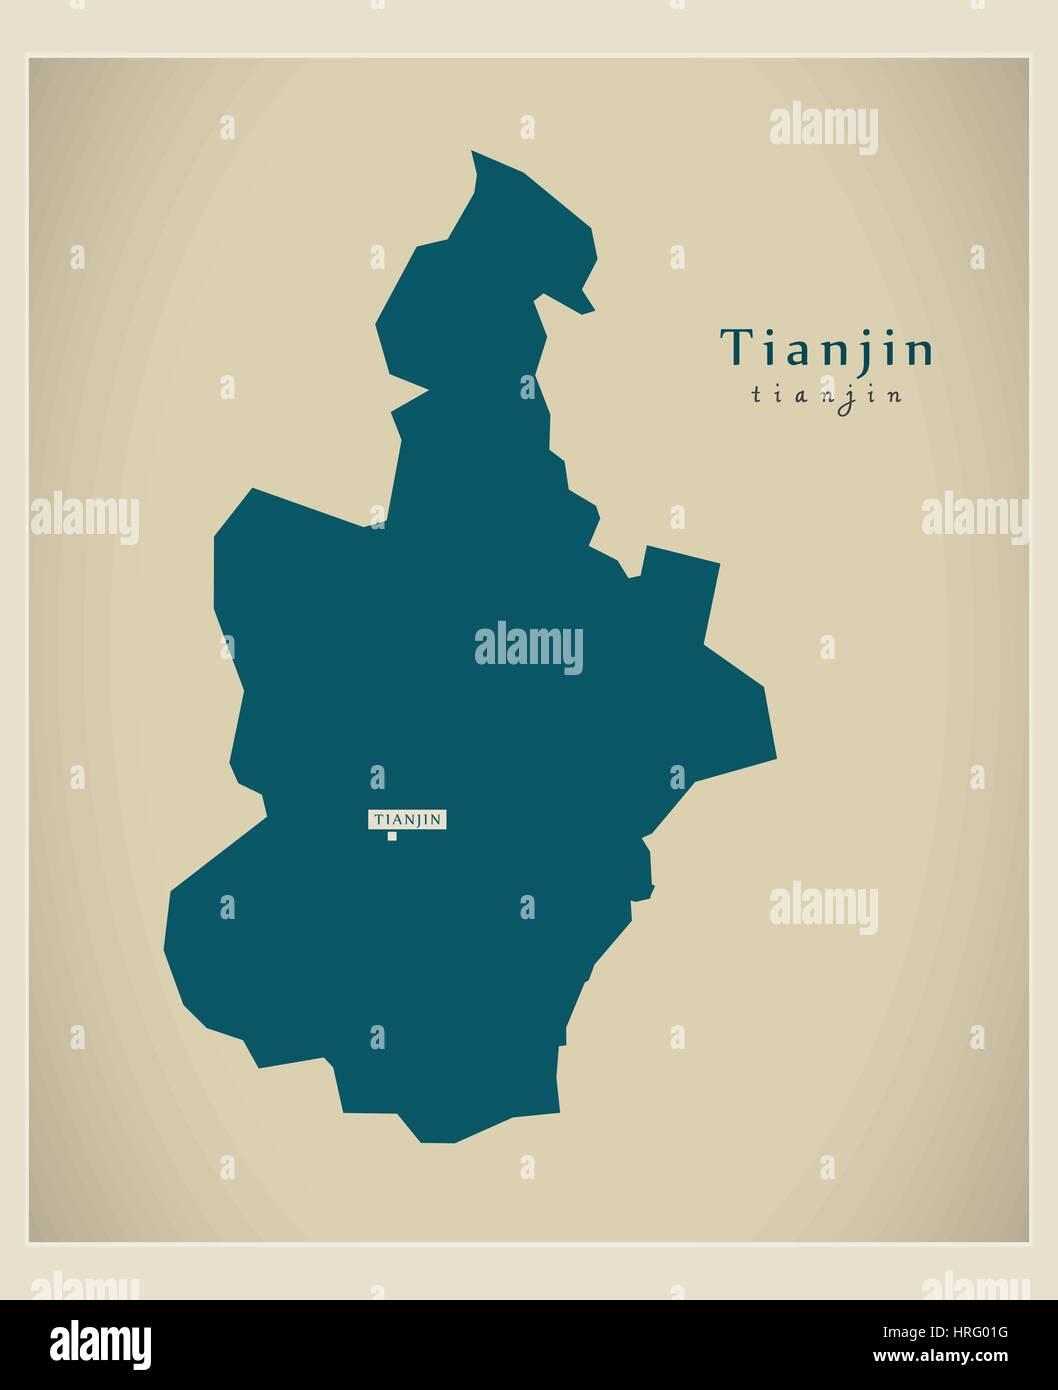 Modern Map - Tianjin - Stock Image